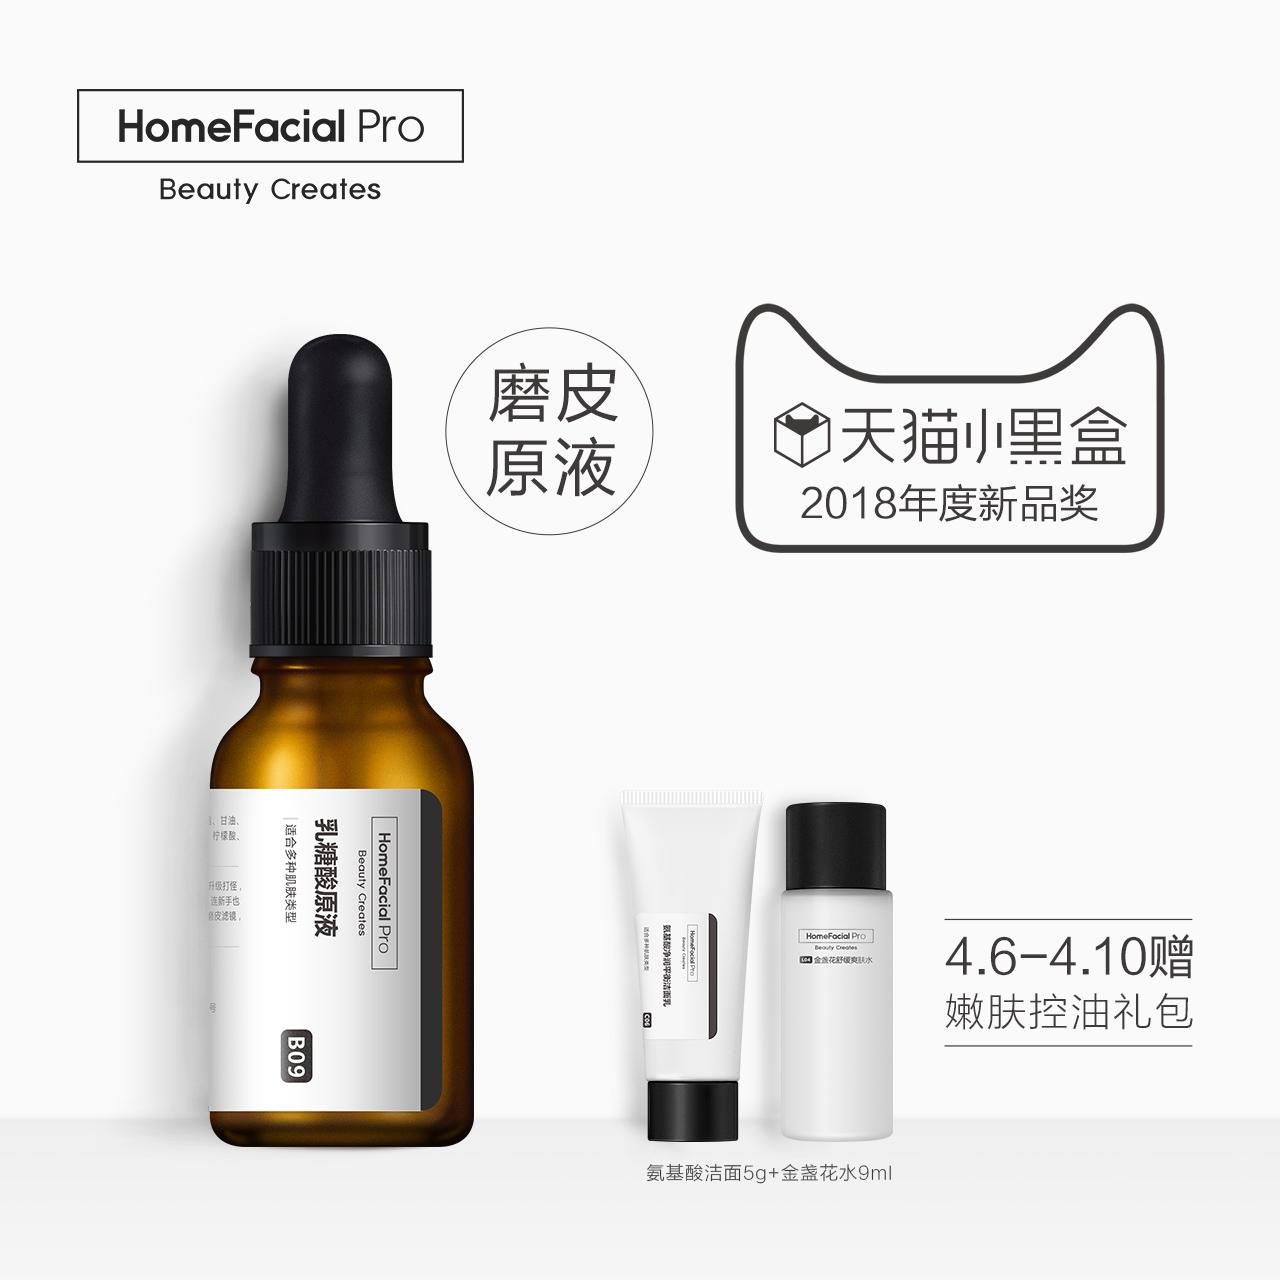 HFP乳糖酸原液 收缩毛孔面部精华液修护毛孔粗大去黑头果酸男女图片